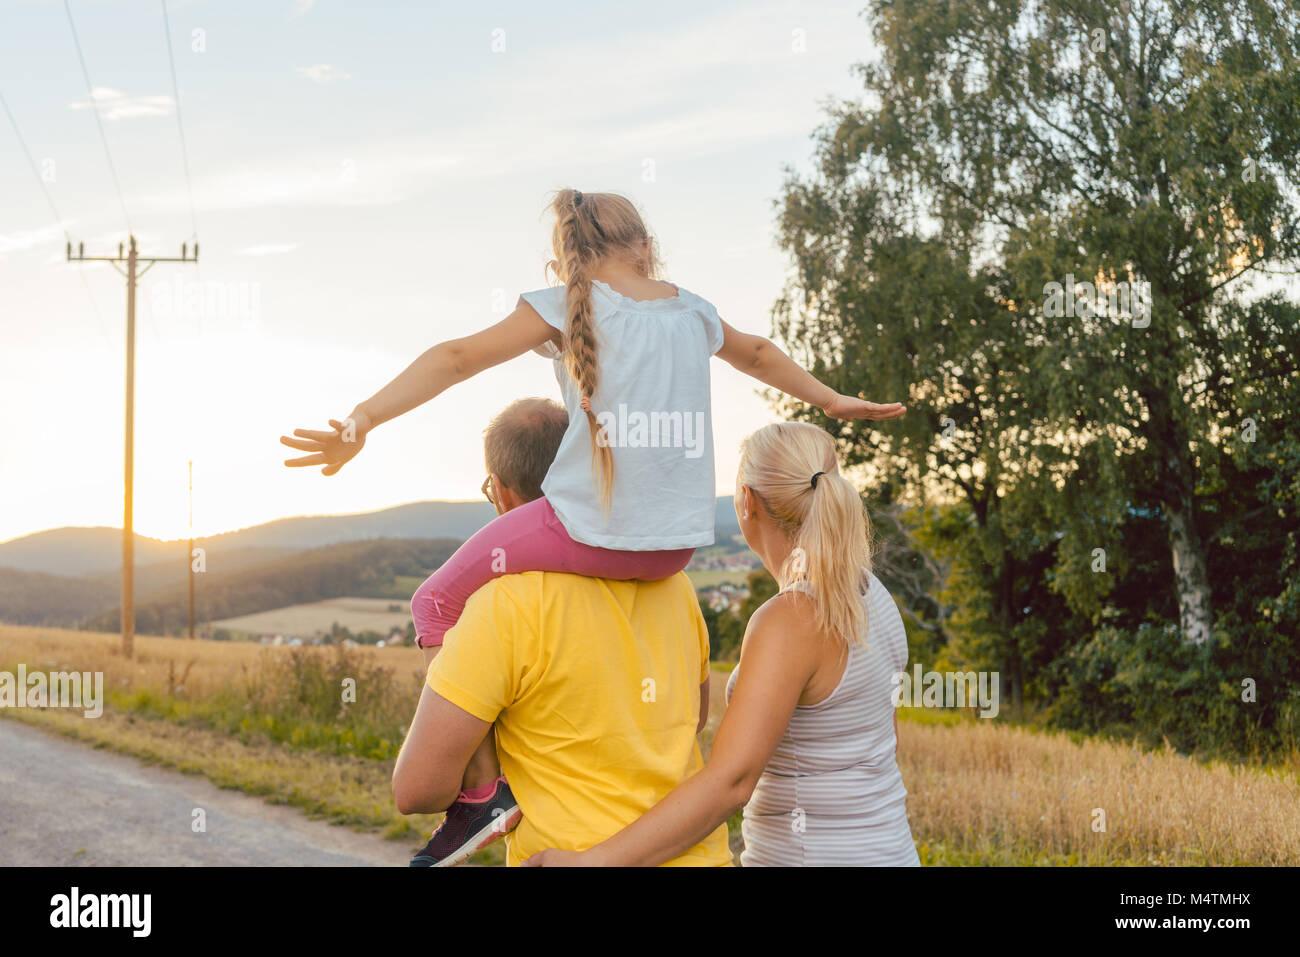 Familie mit Kind Huckepack auf Sommer Spaziergang Stockbild